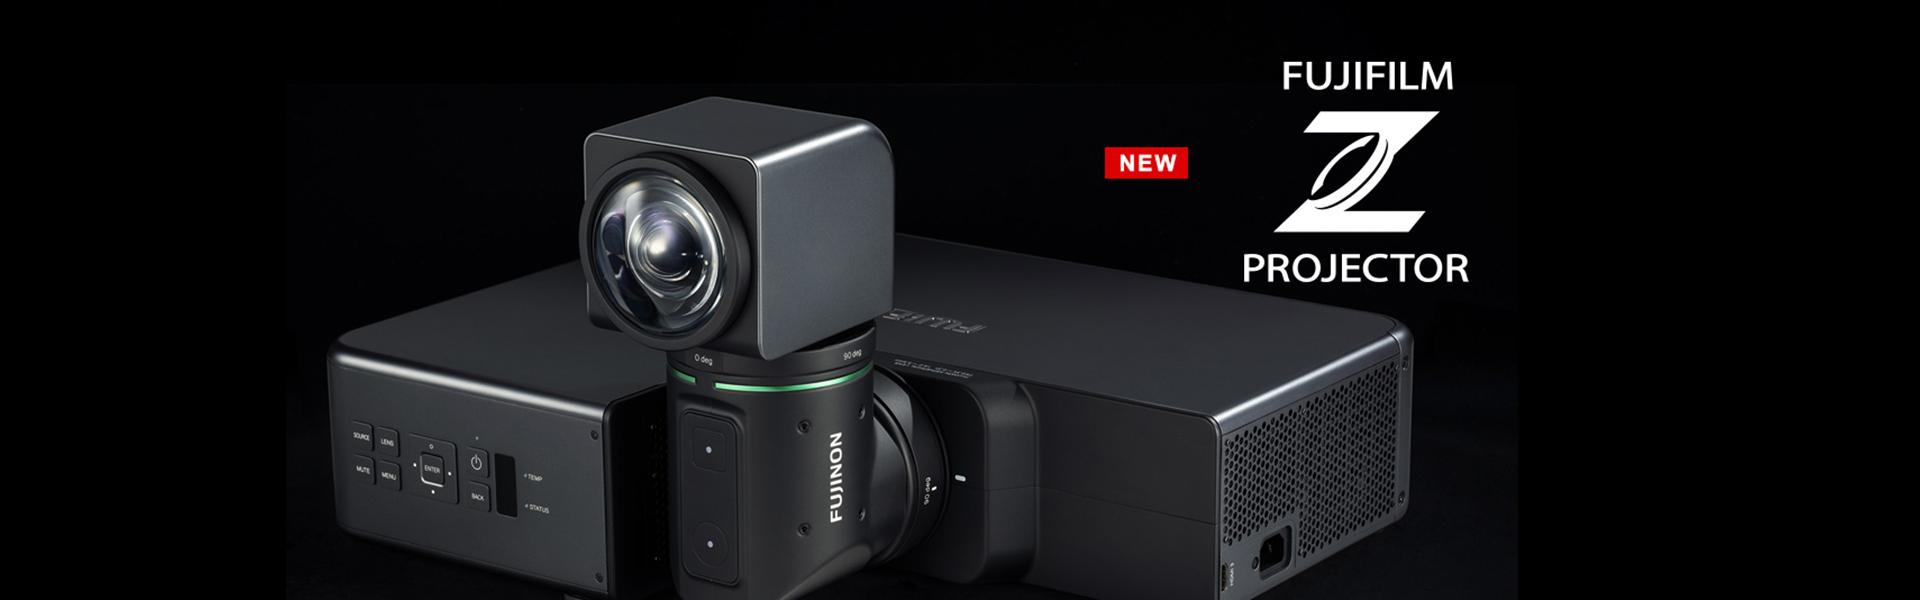 Projector FP-Z5000,超短焦距投影机